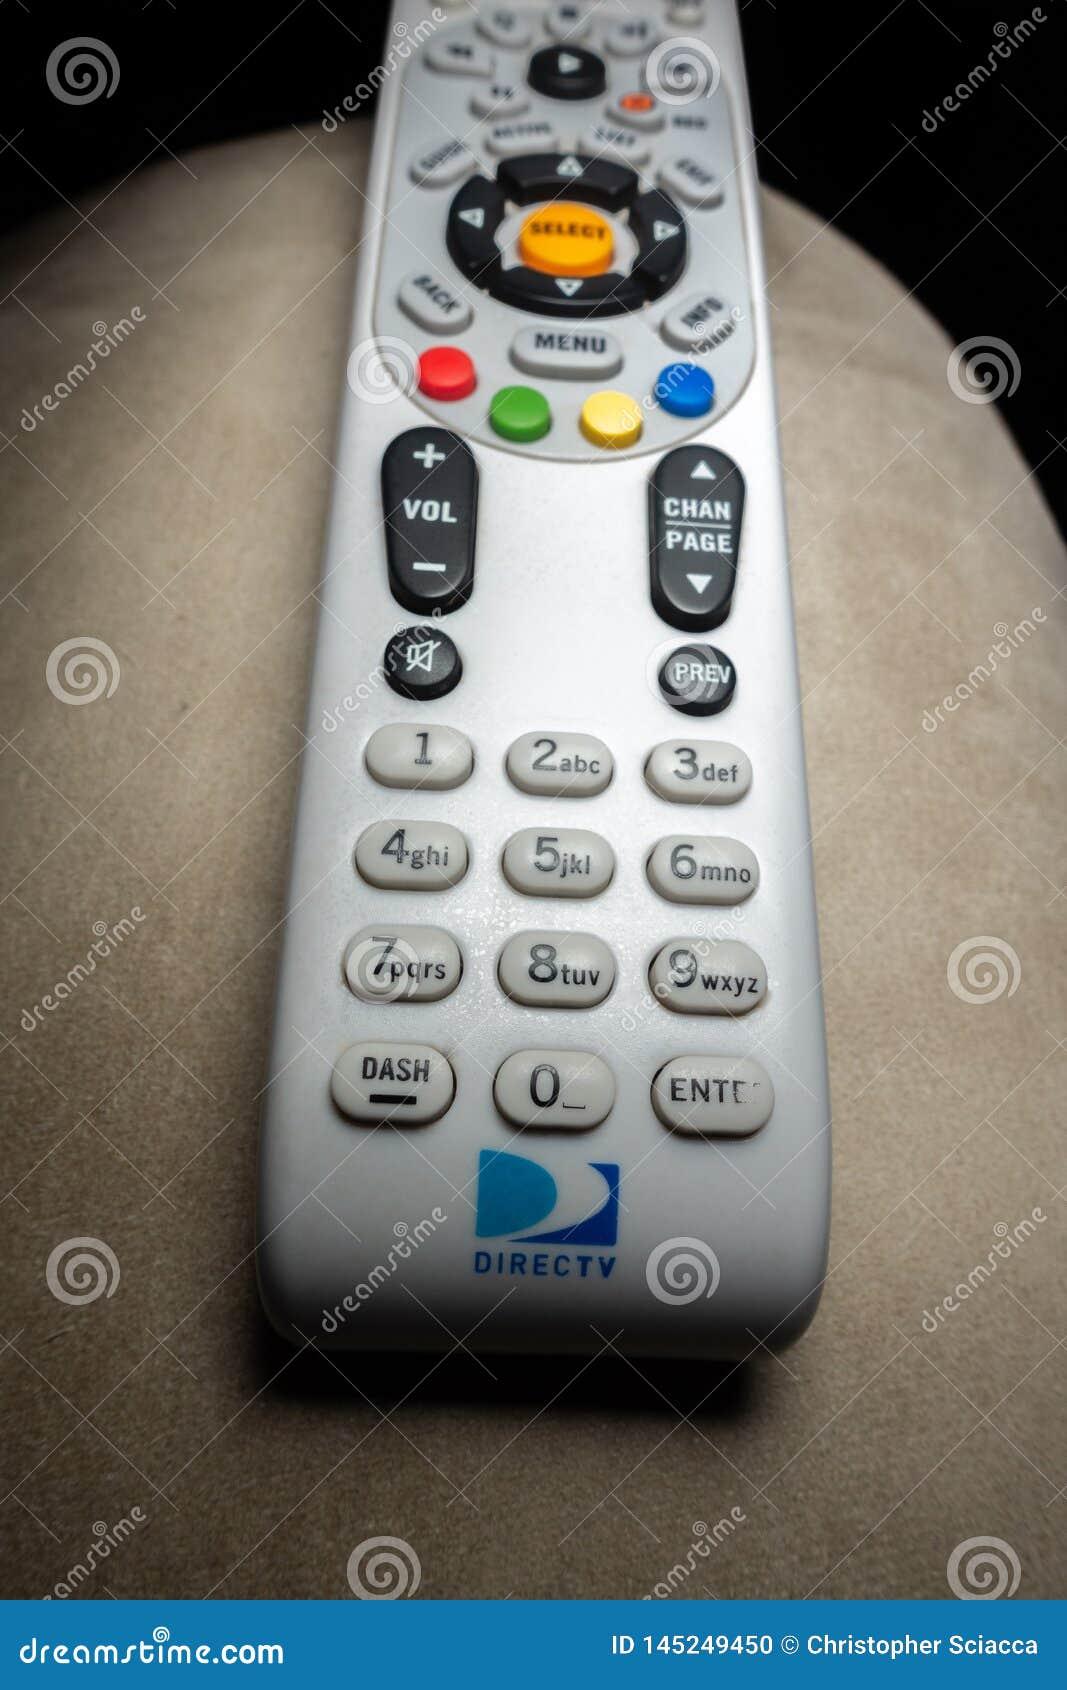 DirecTV avl